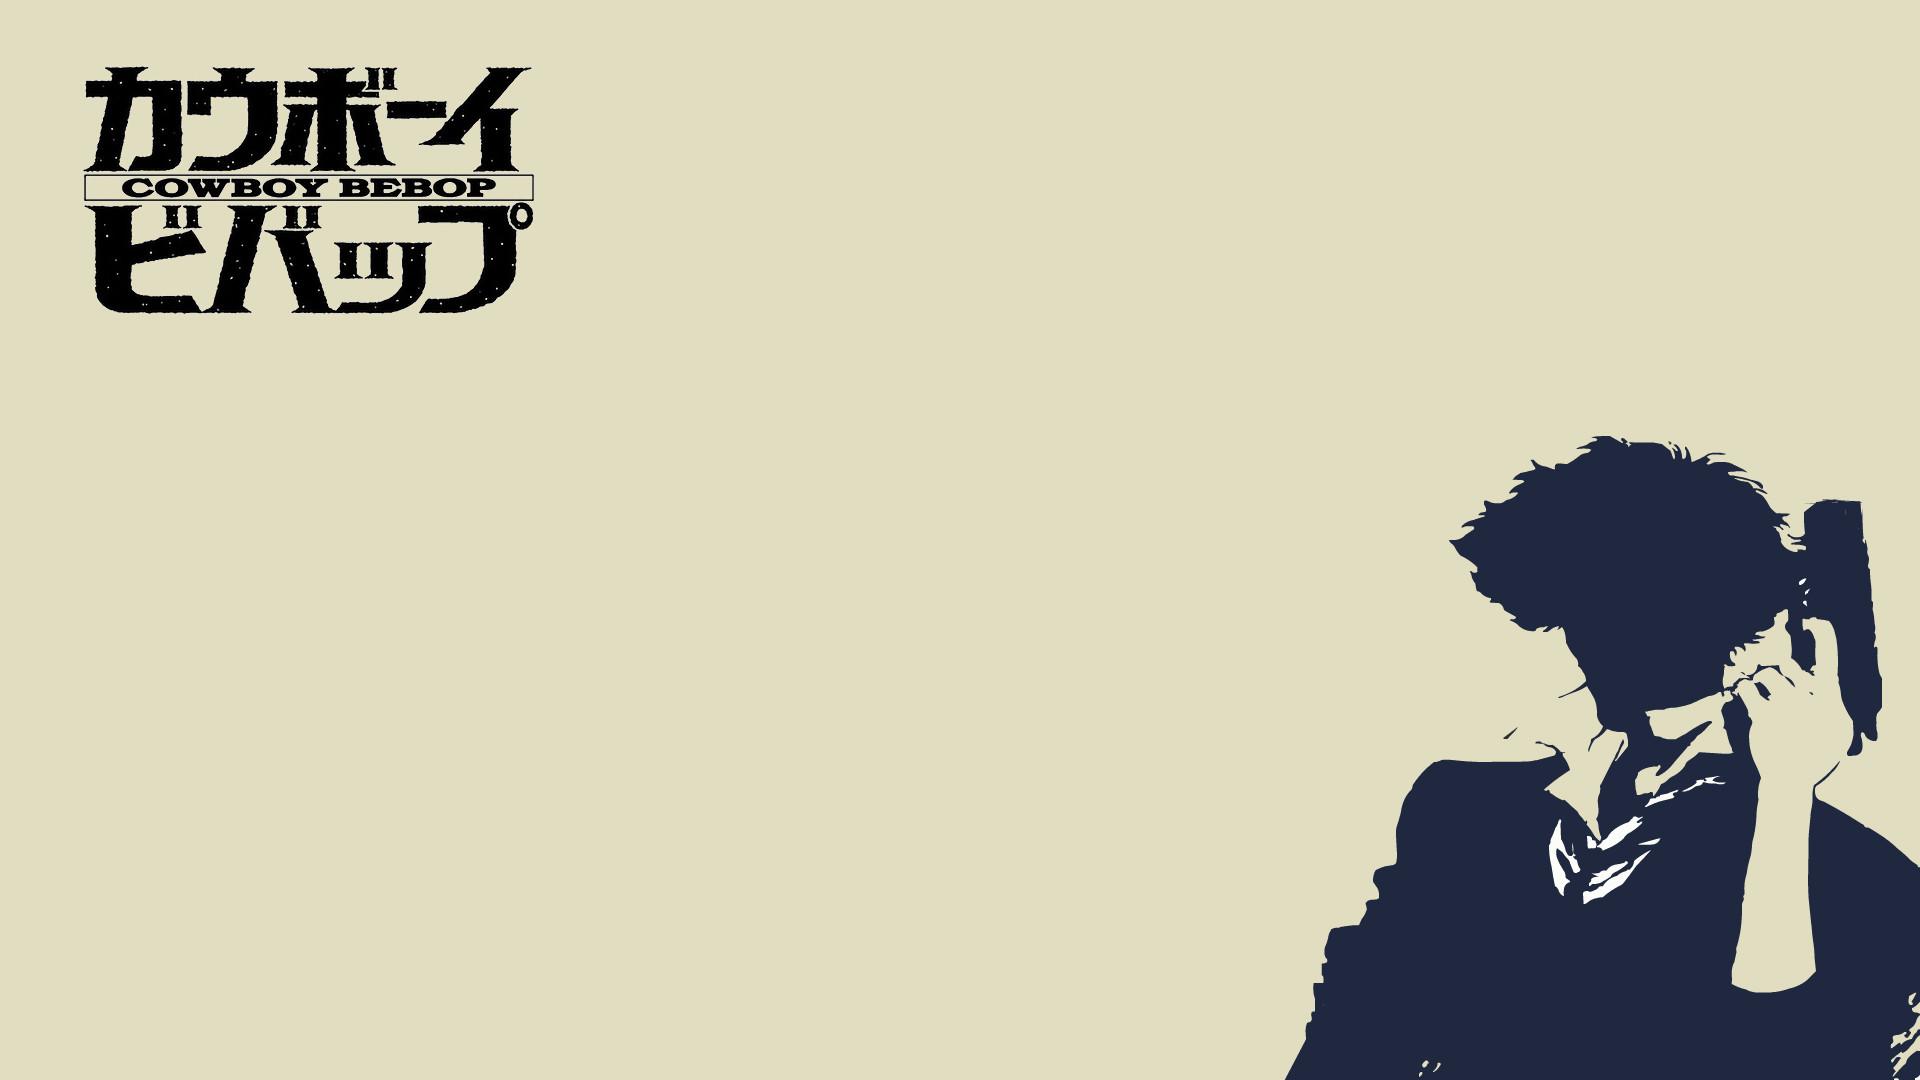 Anime Backgrounds Cowboy Bebop Wallpapers by Robert Mizrahi